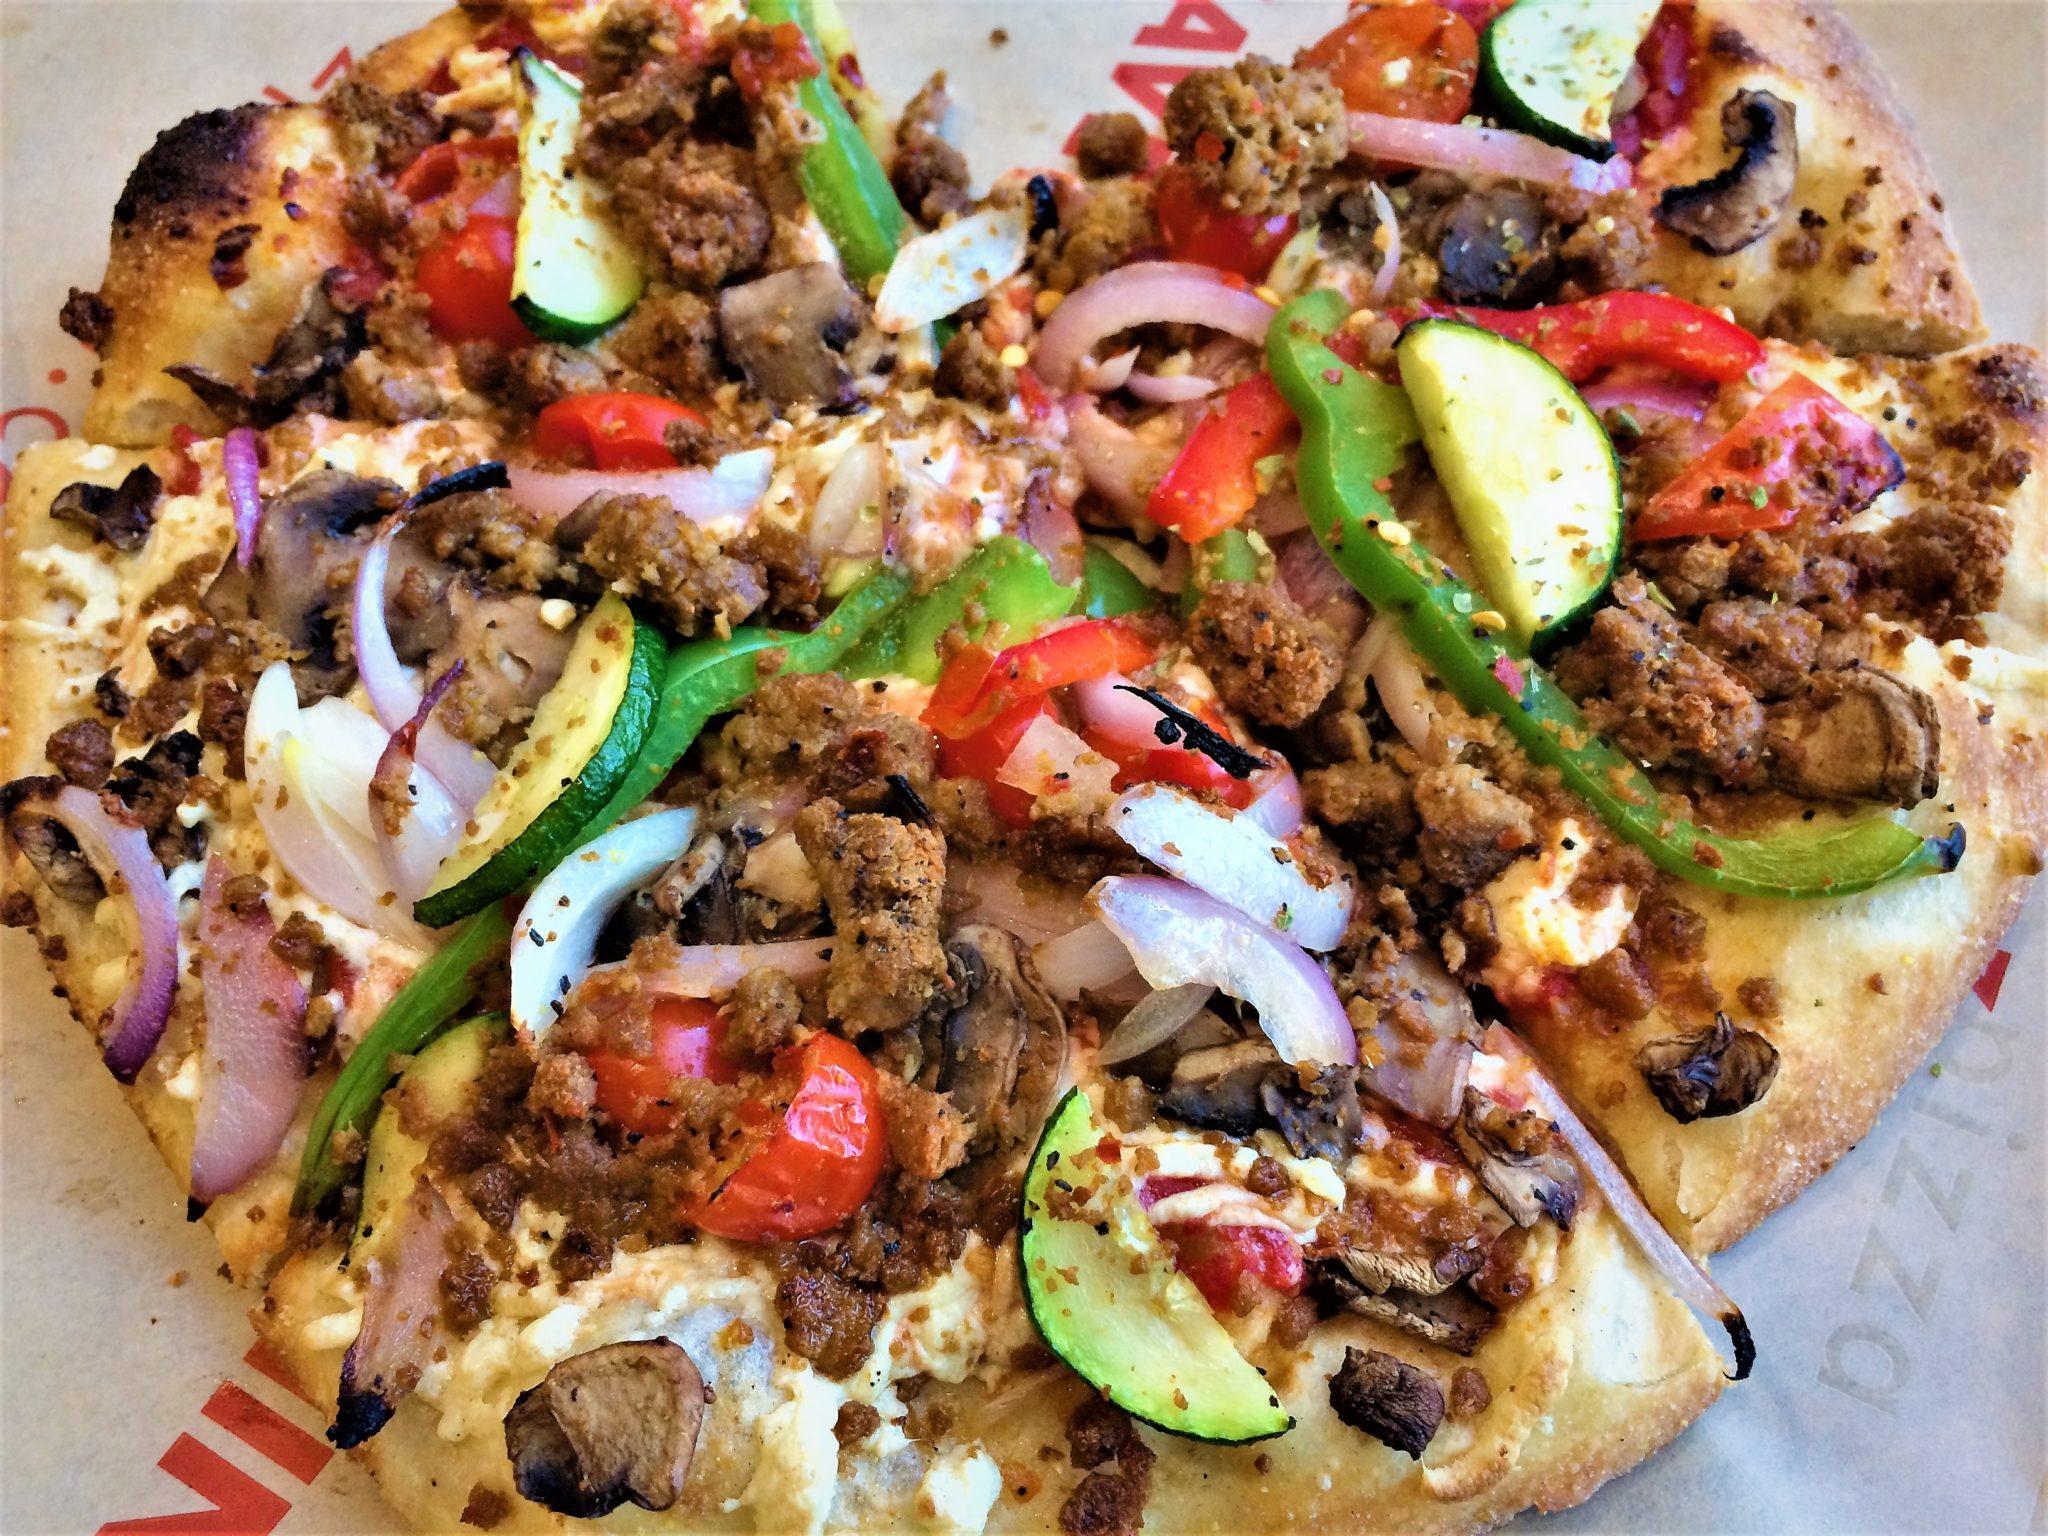 Vegan pizza in los angeles, west hollywood Zpizza vegan food in los angeles